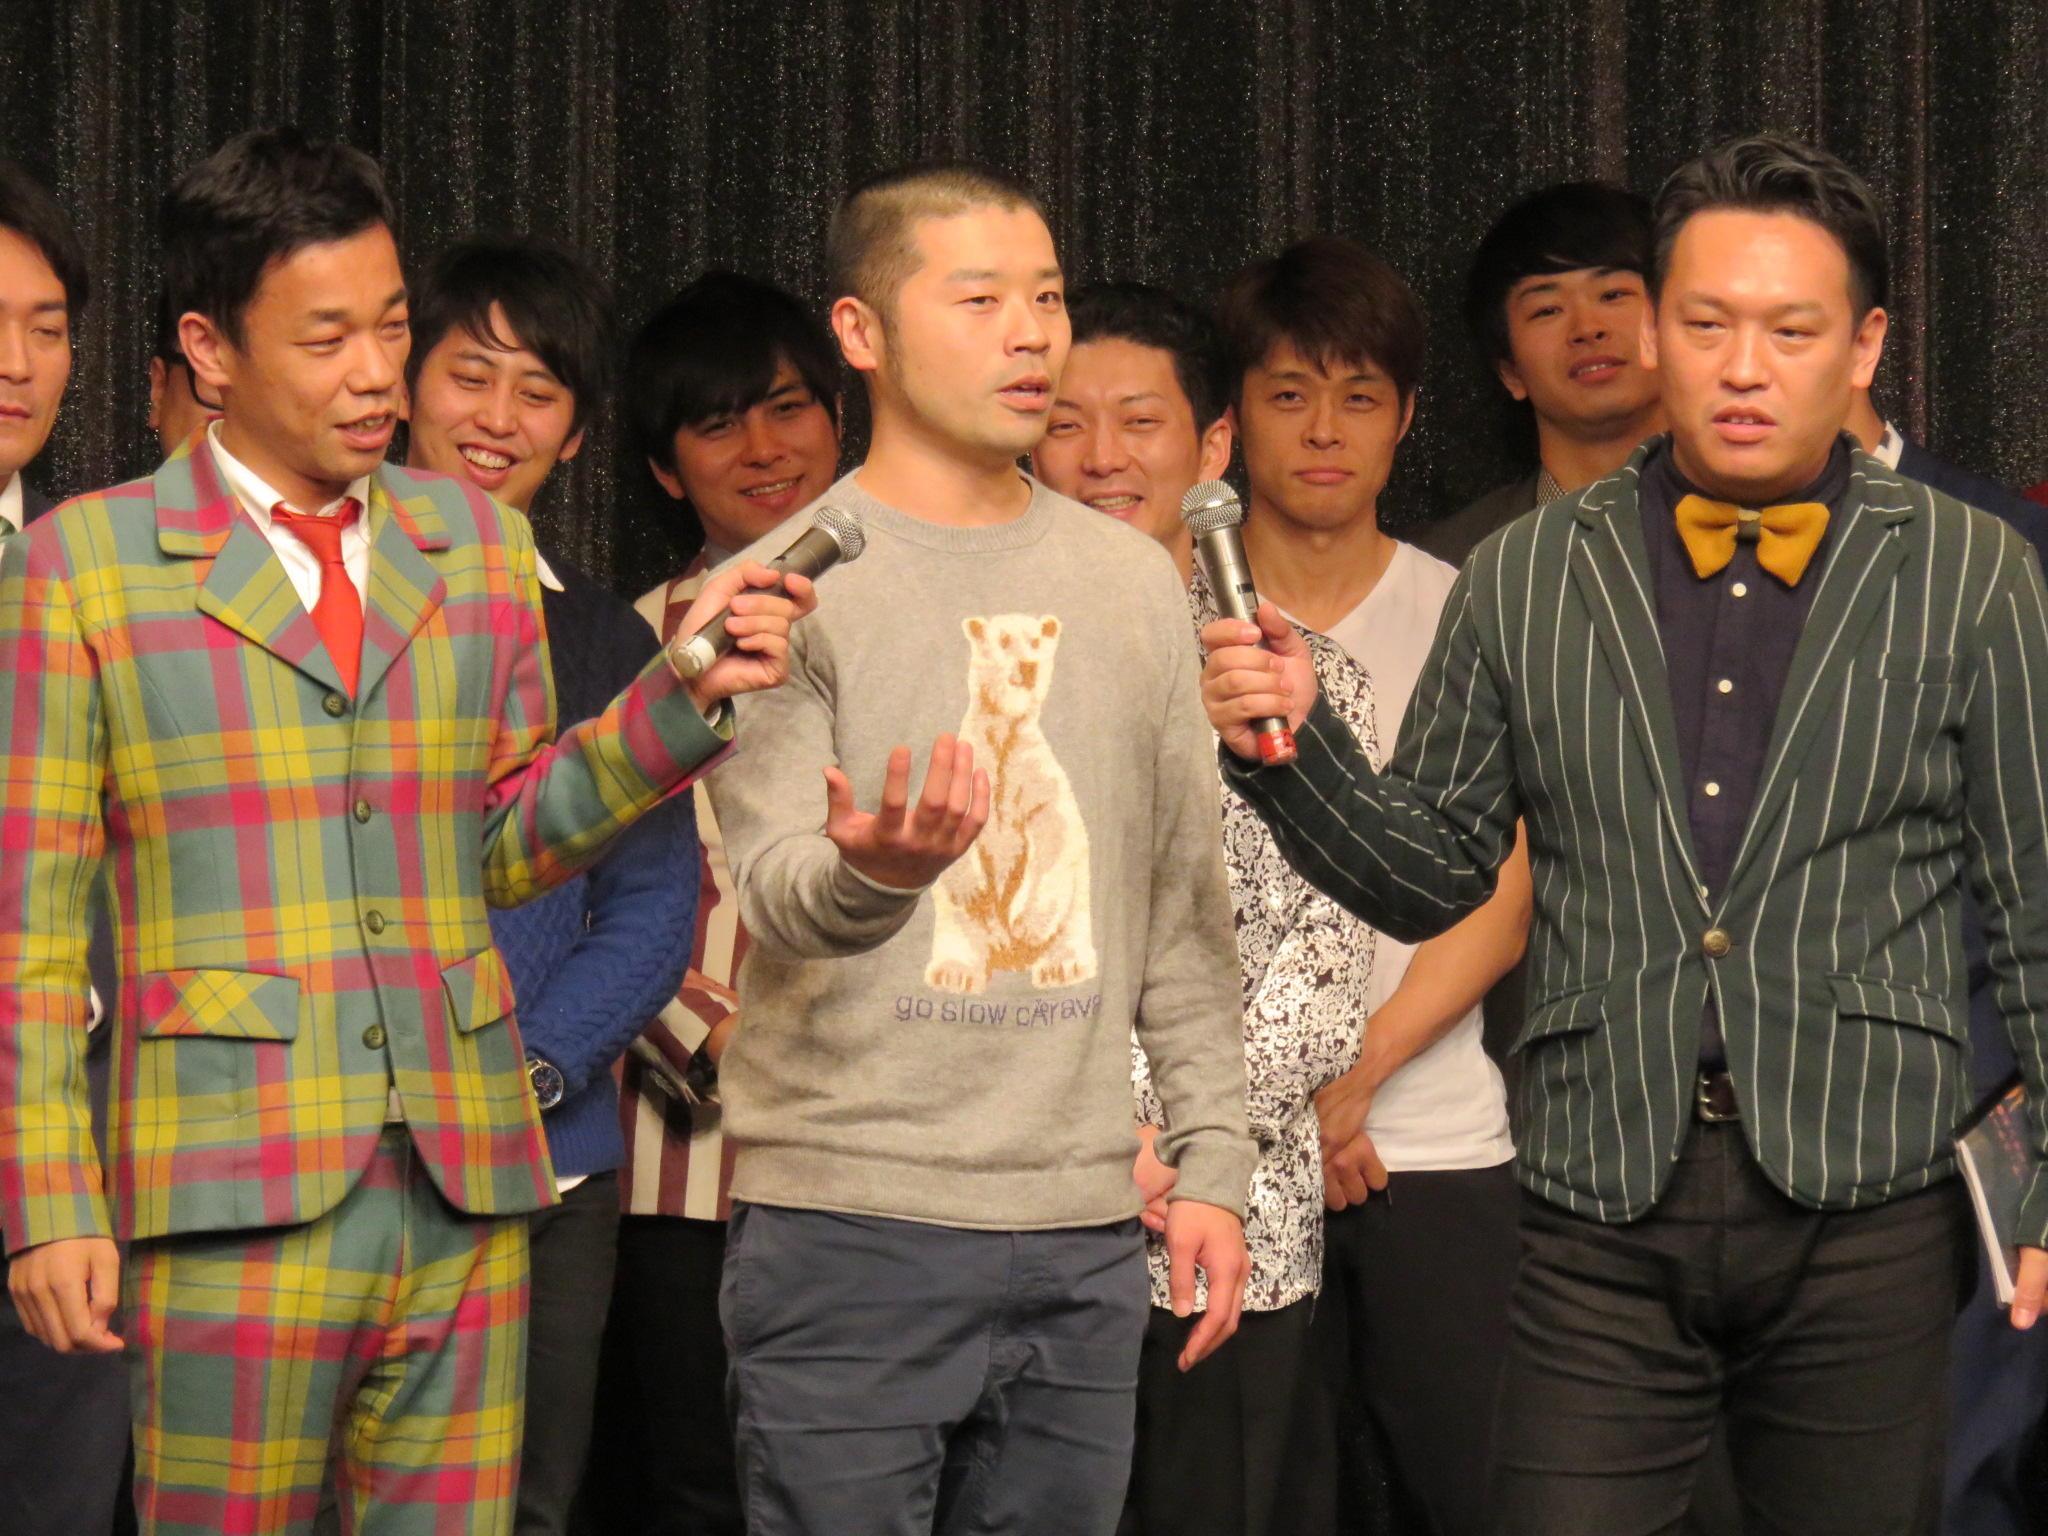 http://news.yoshimoto.co.jp/20151230170014-abd18cdedb0f66eb24828d4aebc818e0ba790c81.jpg